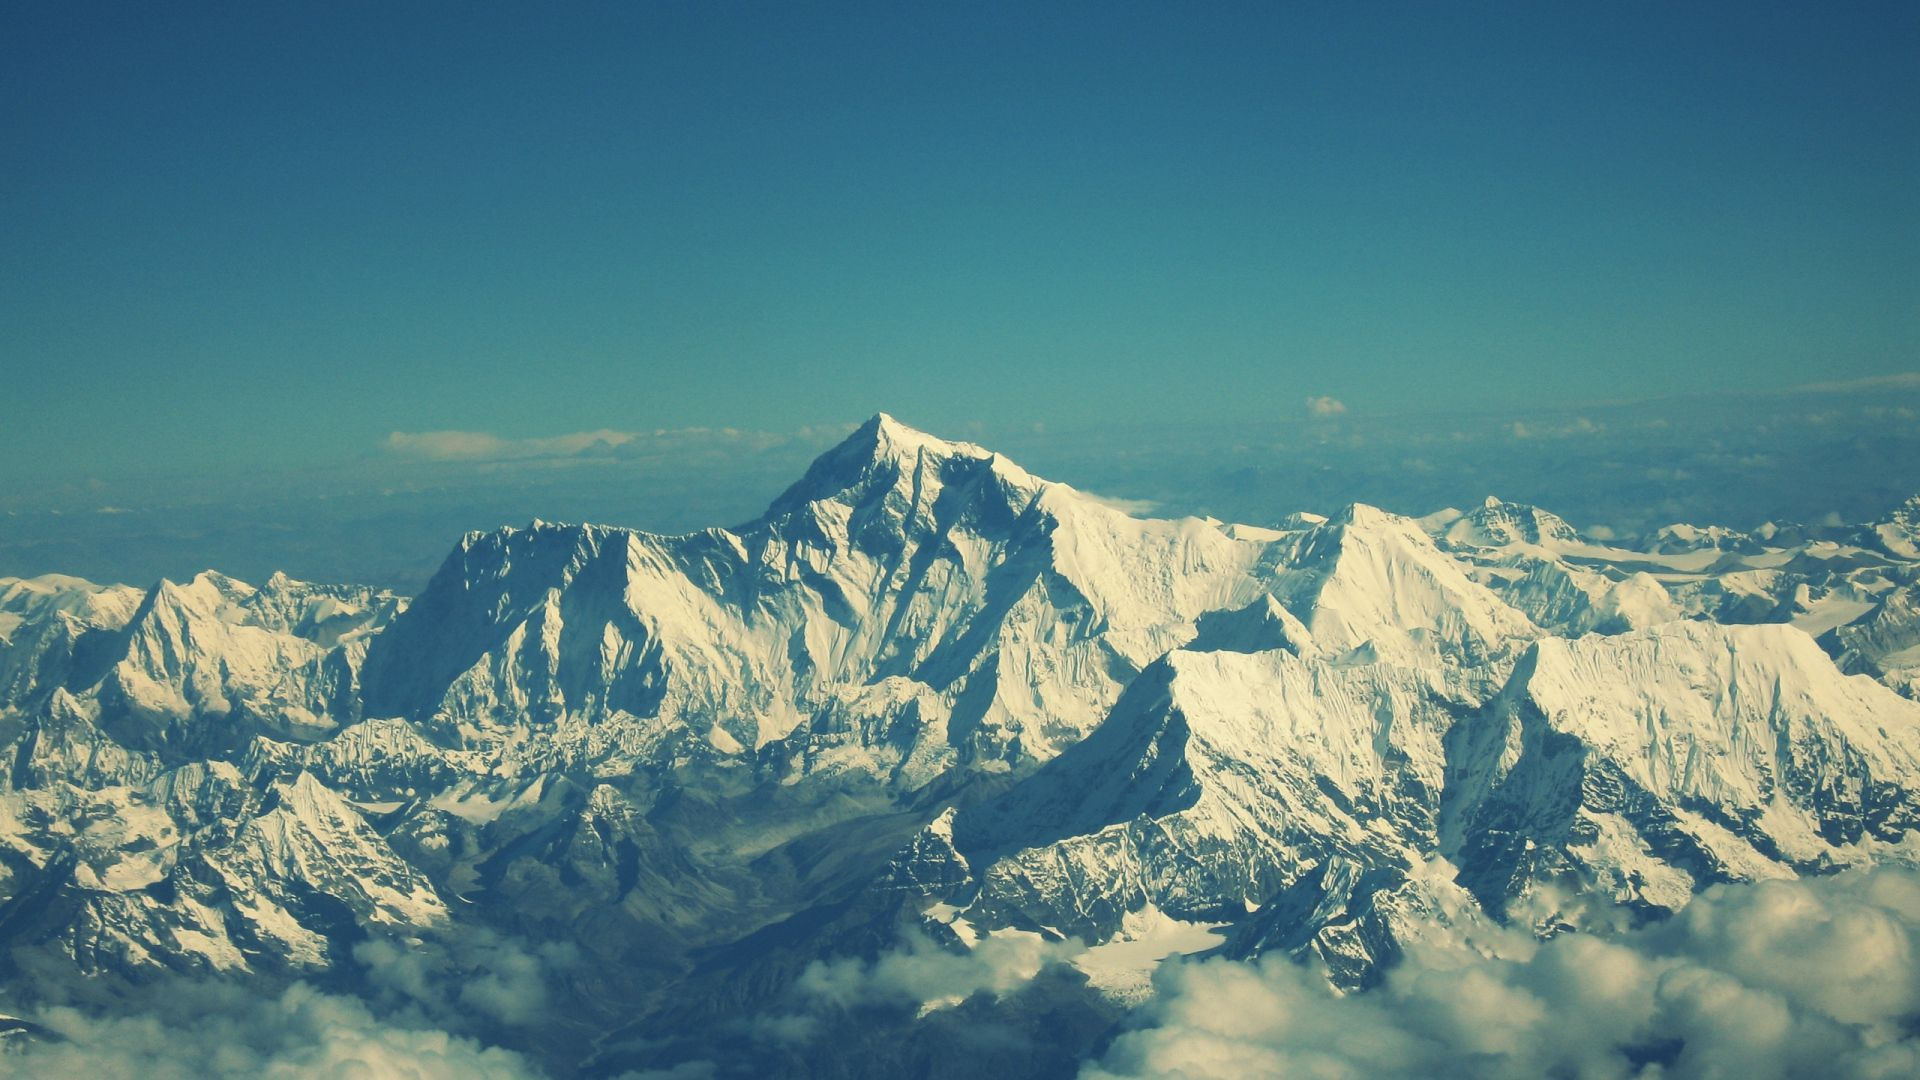 1920x1080 Wallpaper Everest Mountain Sky Tops Landscape Wallpaper Mountain Wallpaper Mountain Images